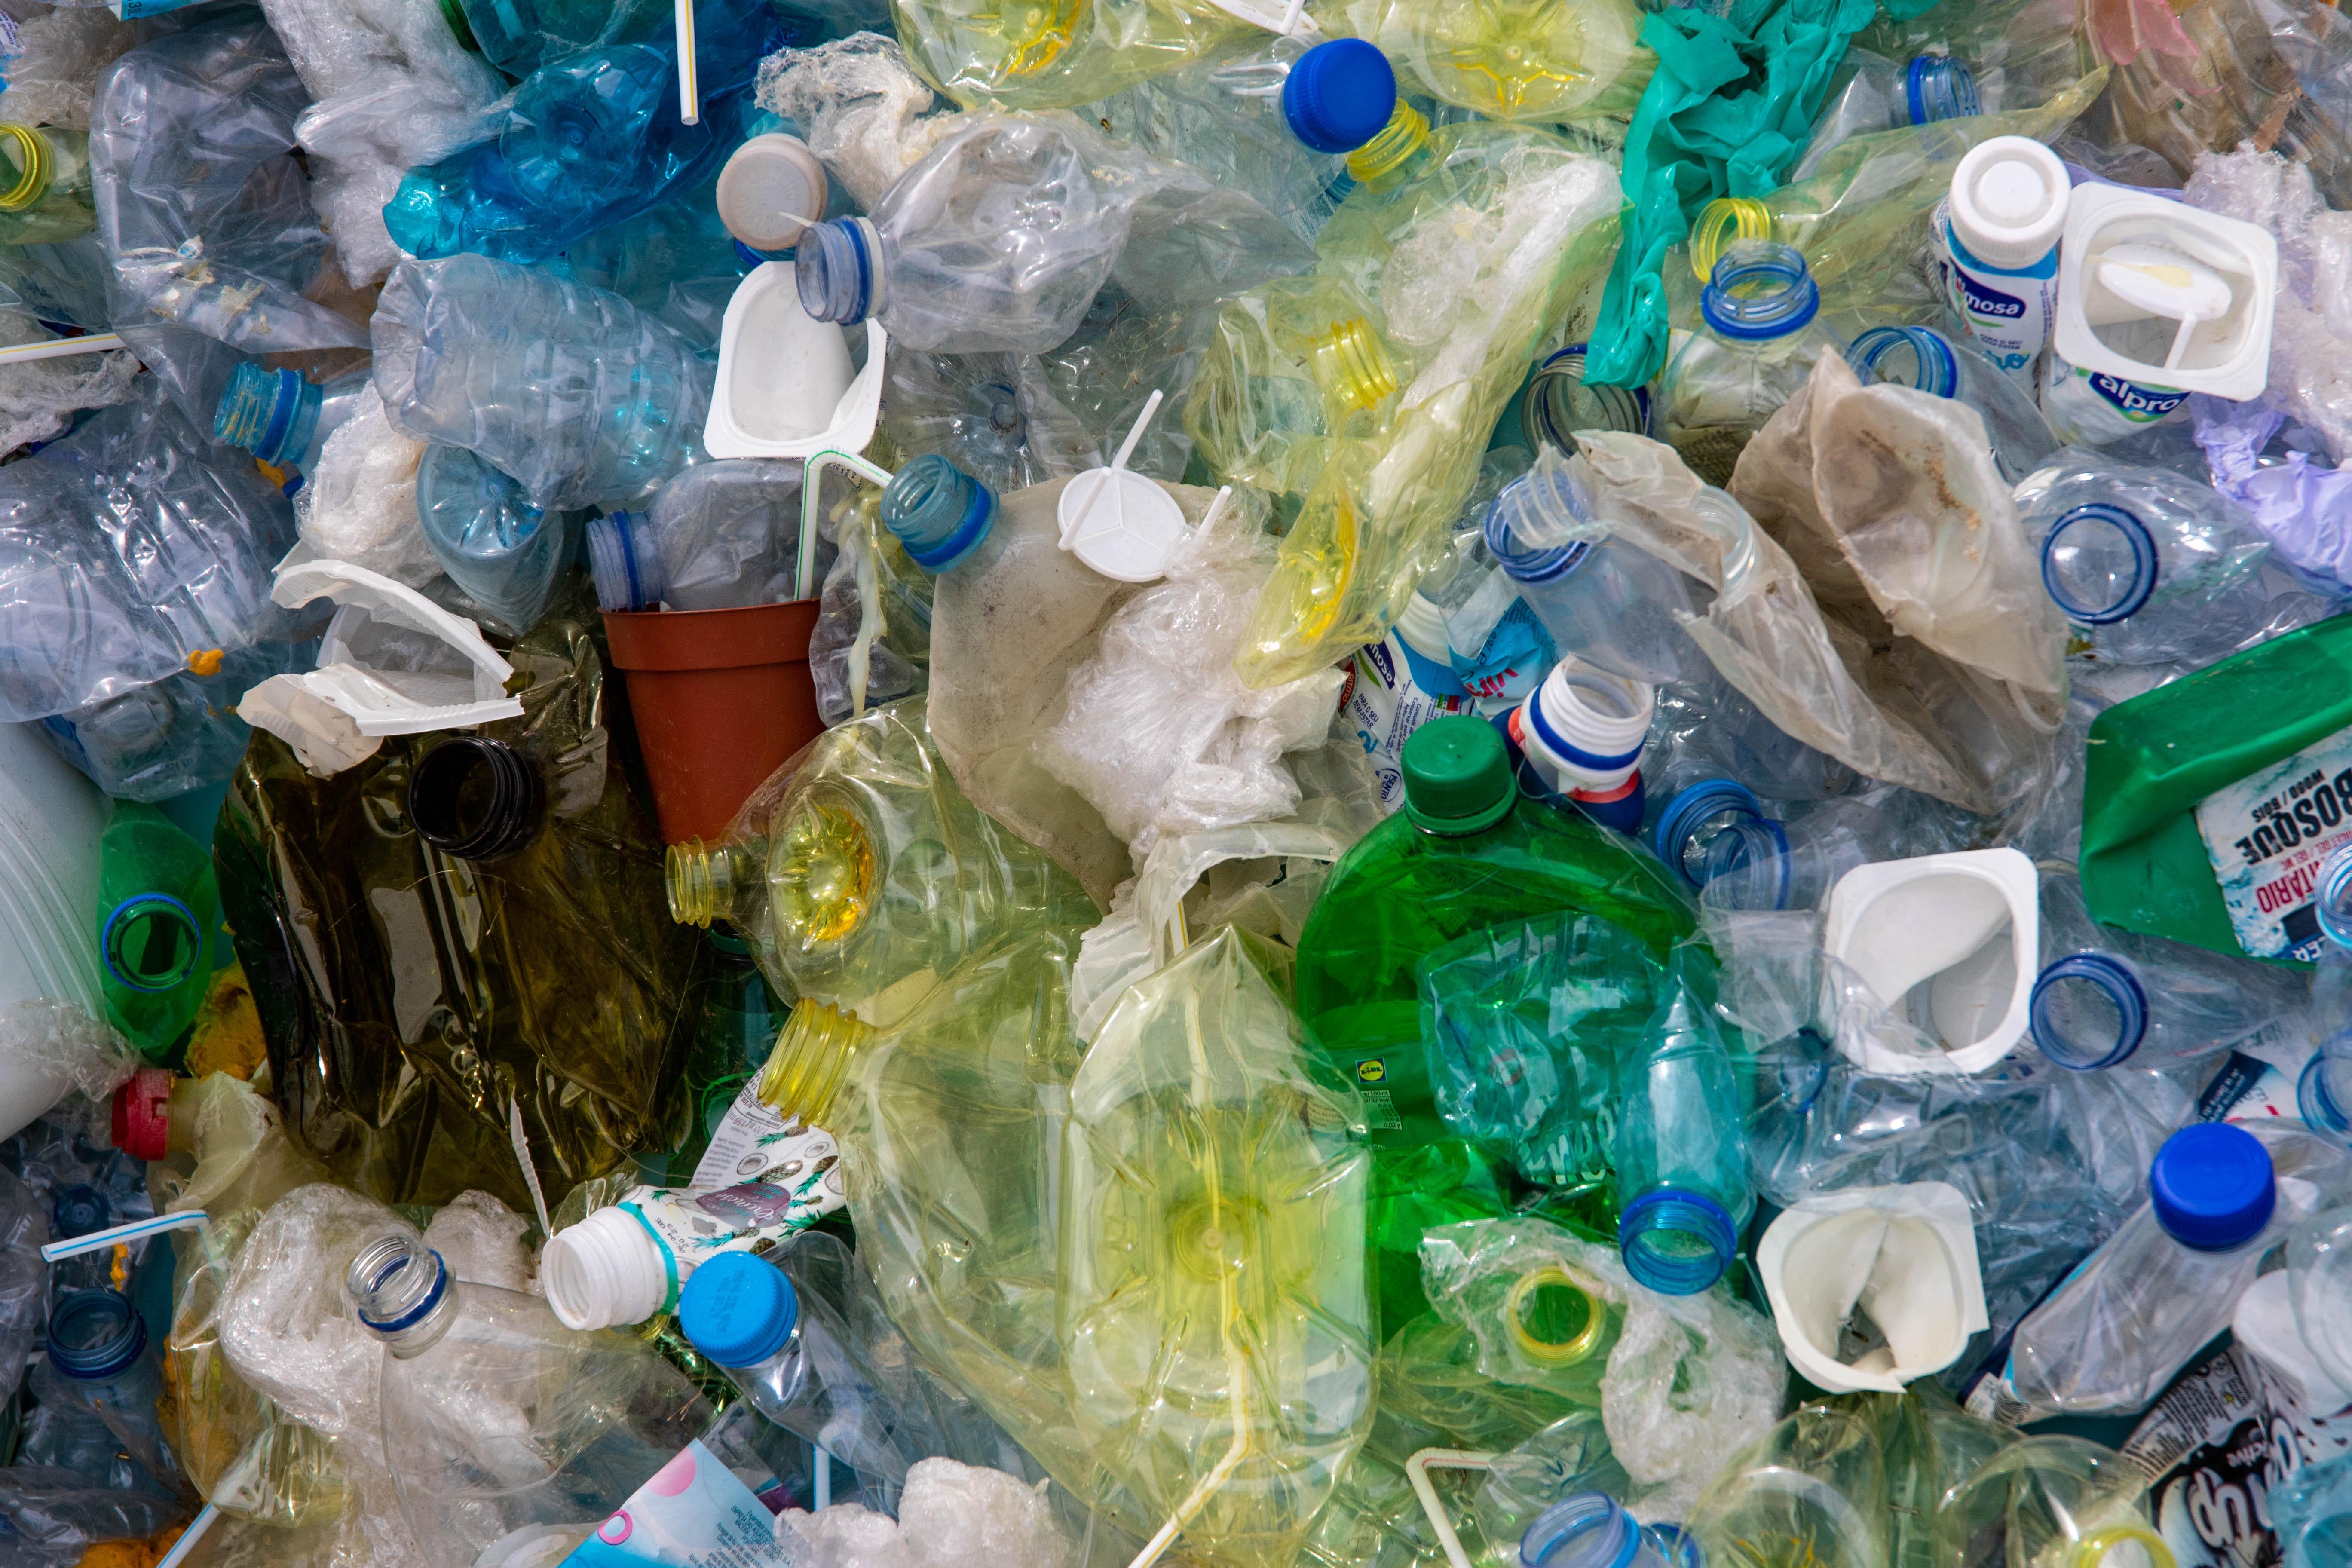 bottles-dirty-disposal-2547565